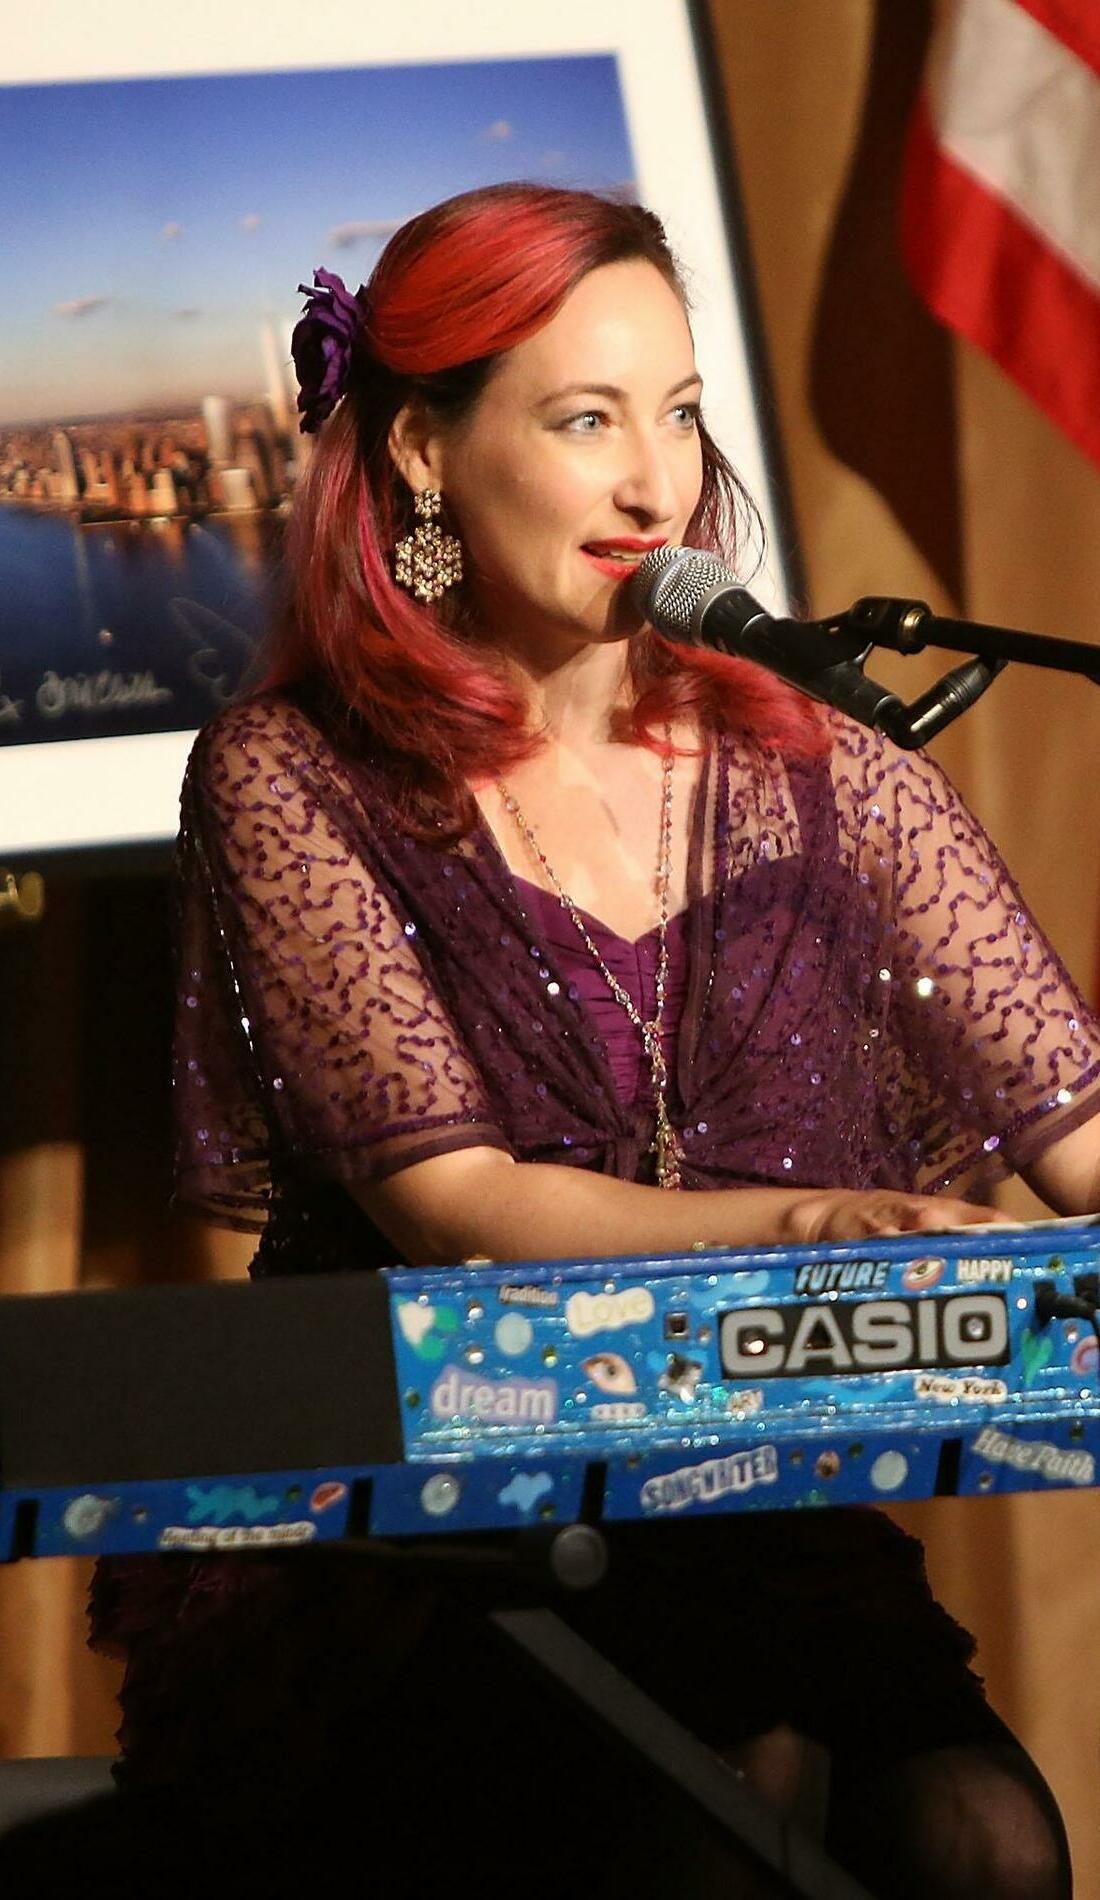 A Rachael Sage live event